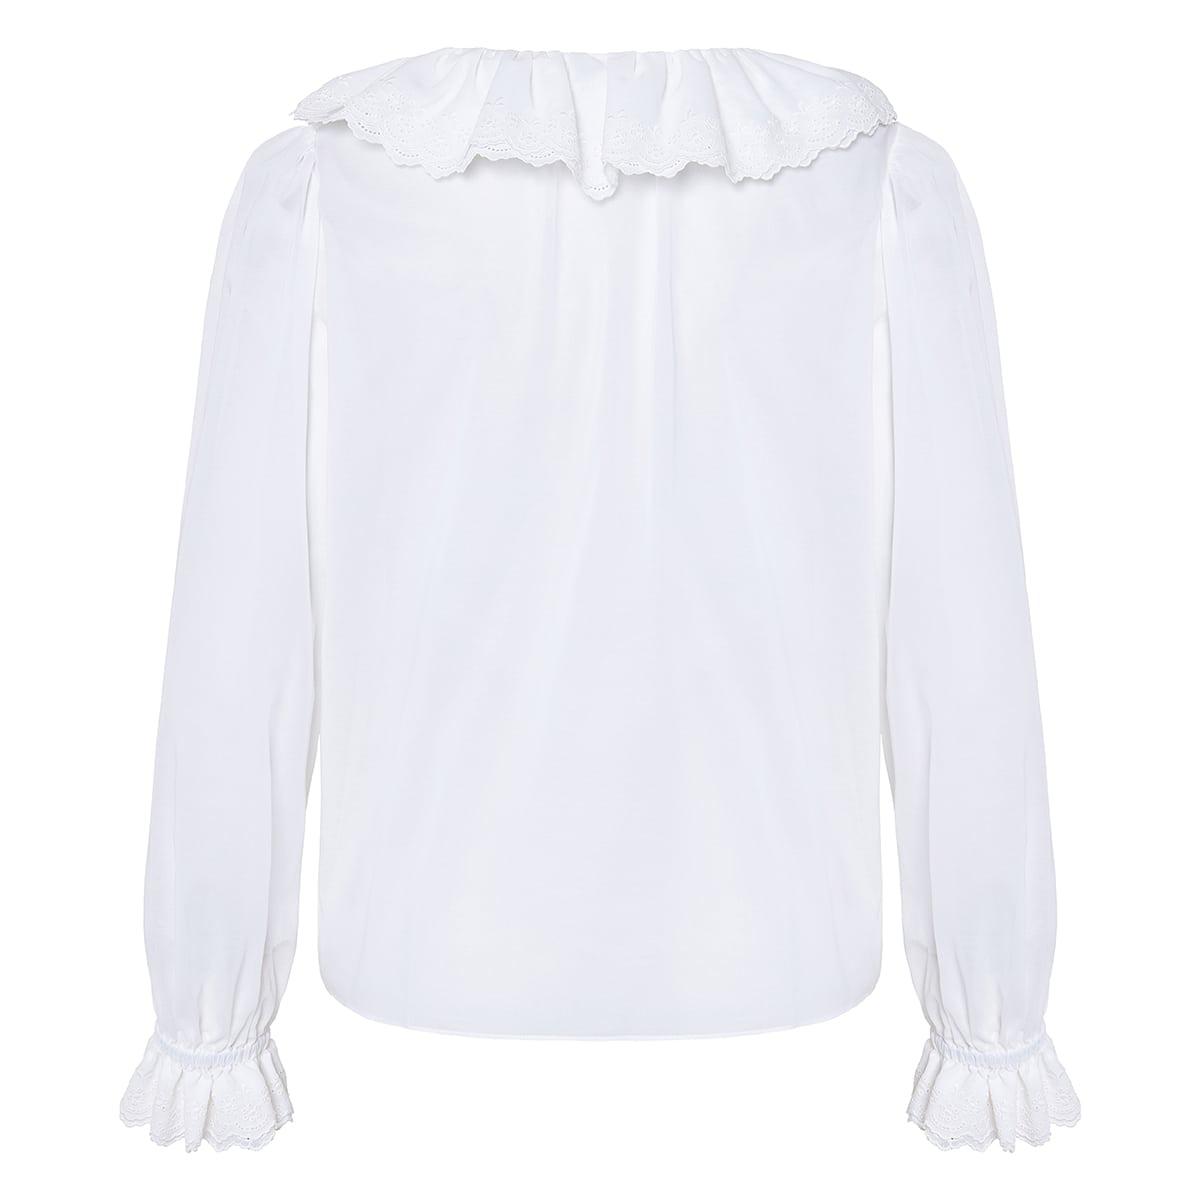 Ruffled cotton blouse